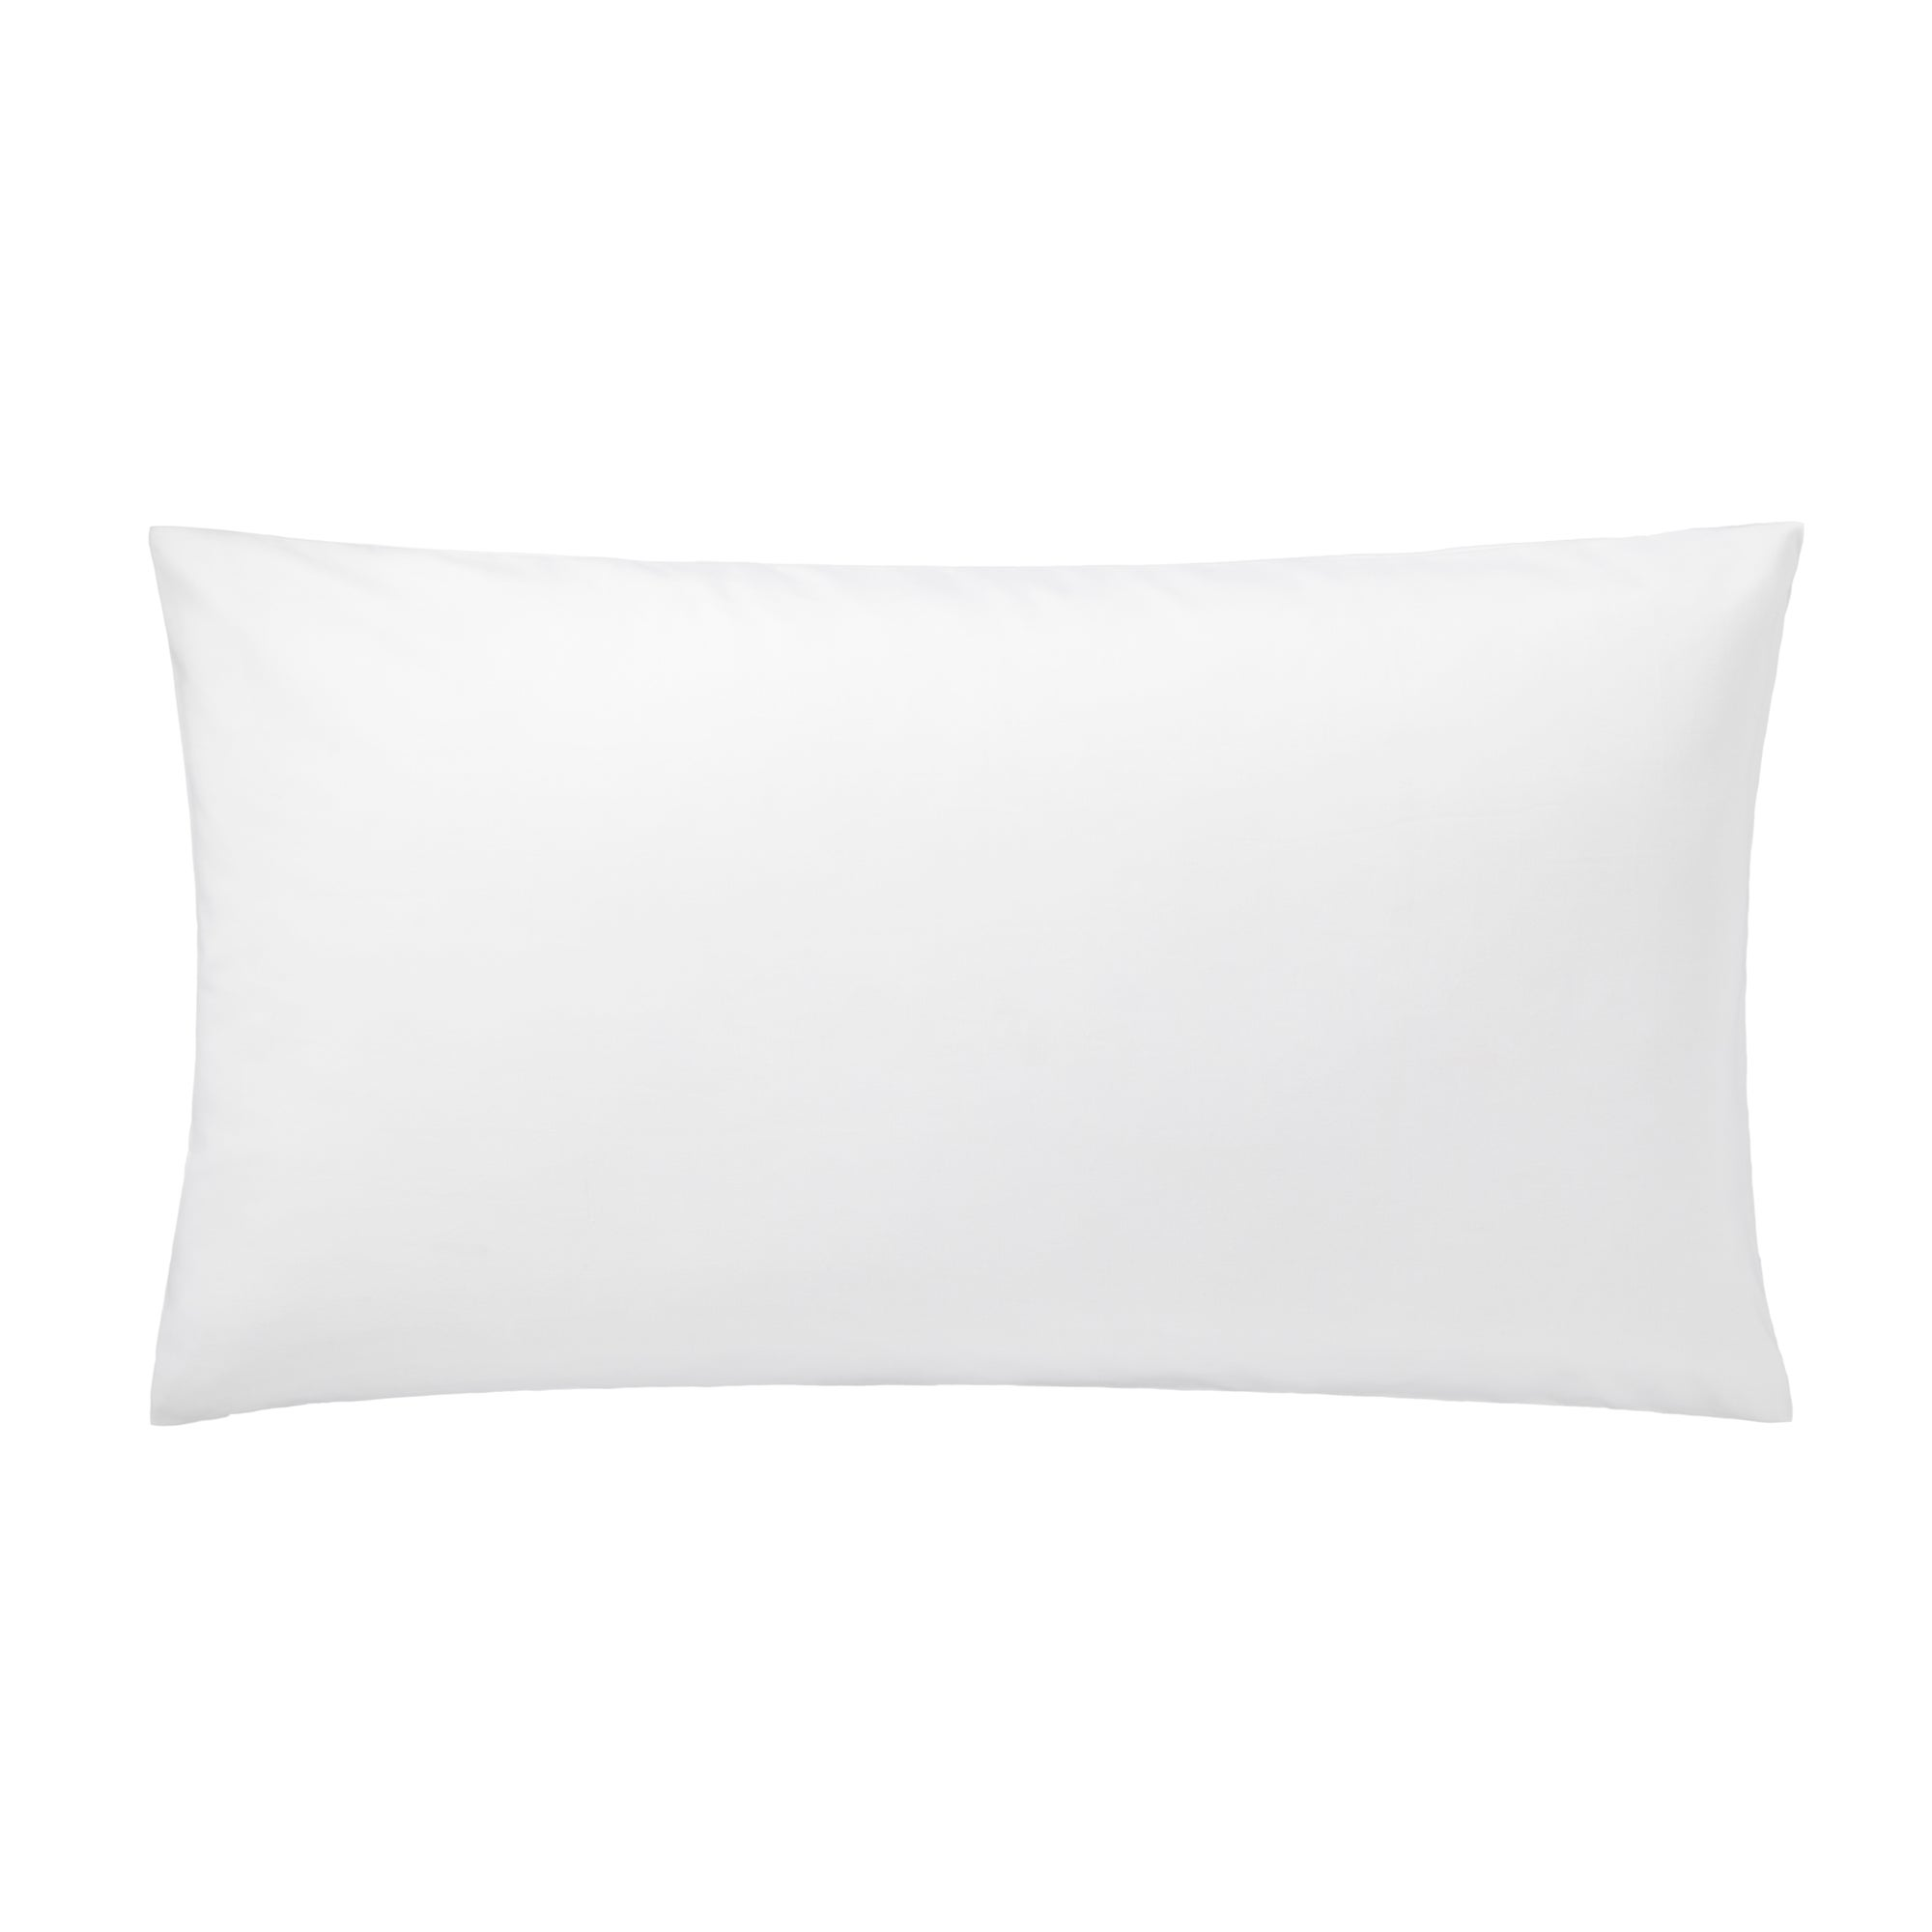 White Hotel Plain 300 Thread Count Collection Kingsize Pillowcase